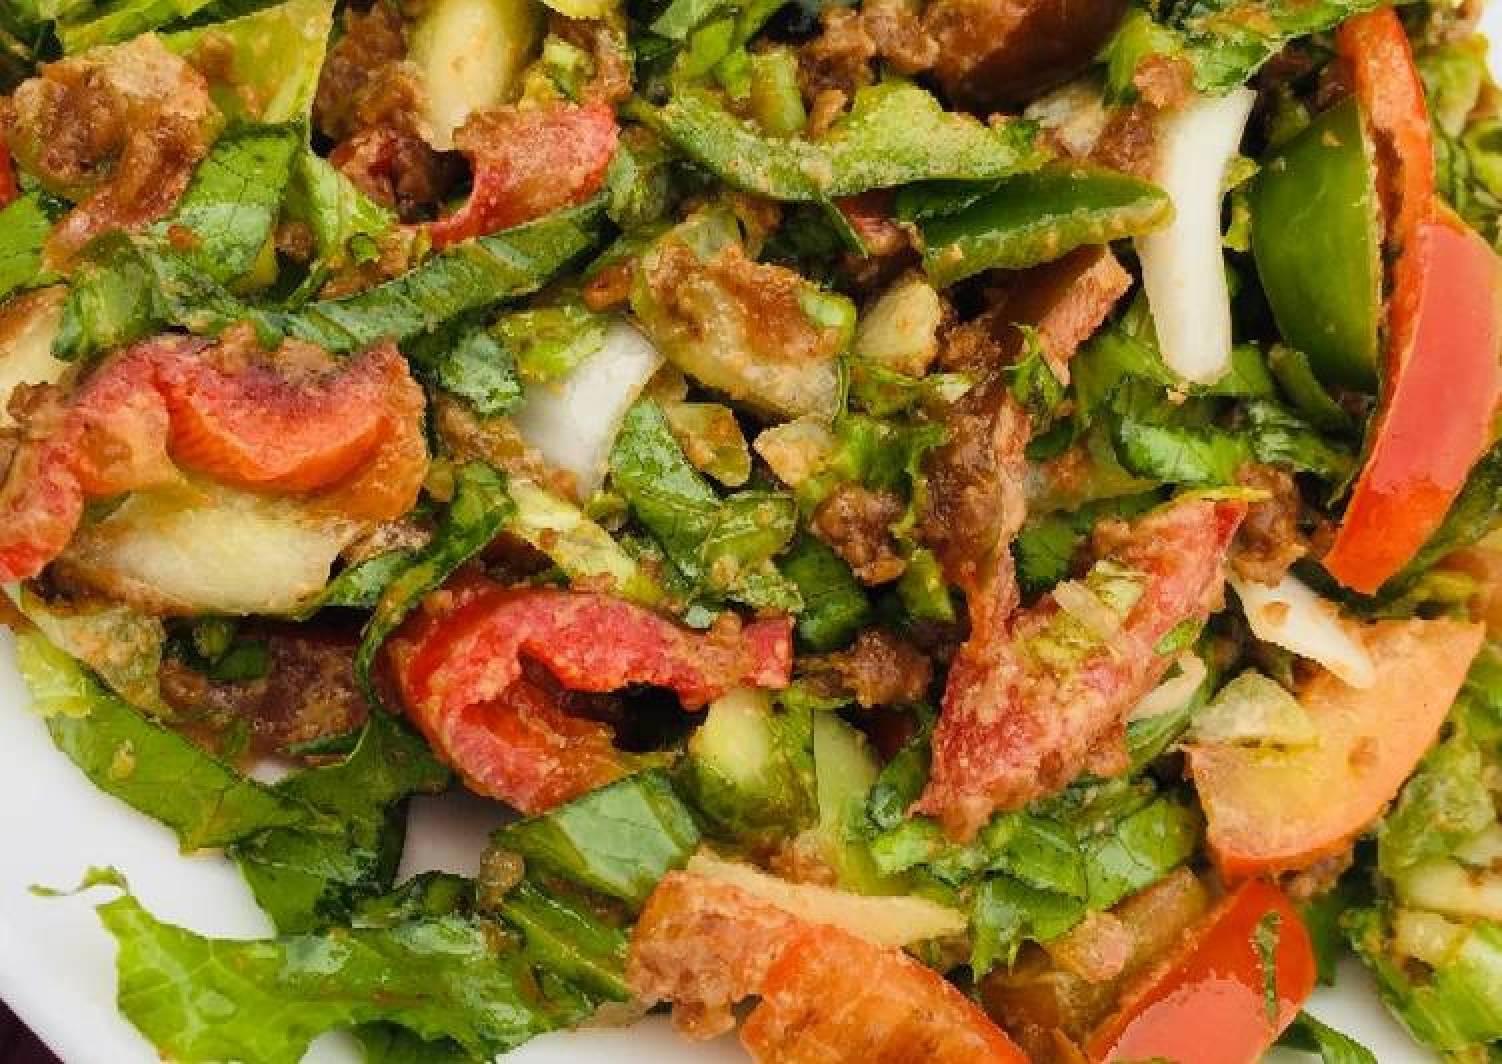 Lettuce salad (locally)